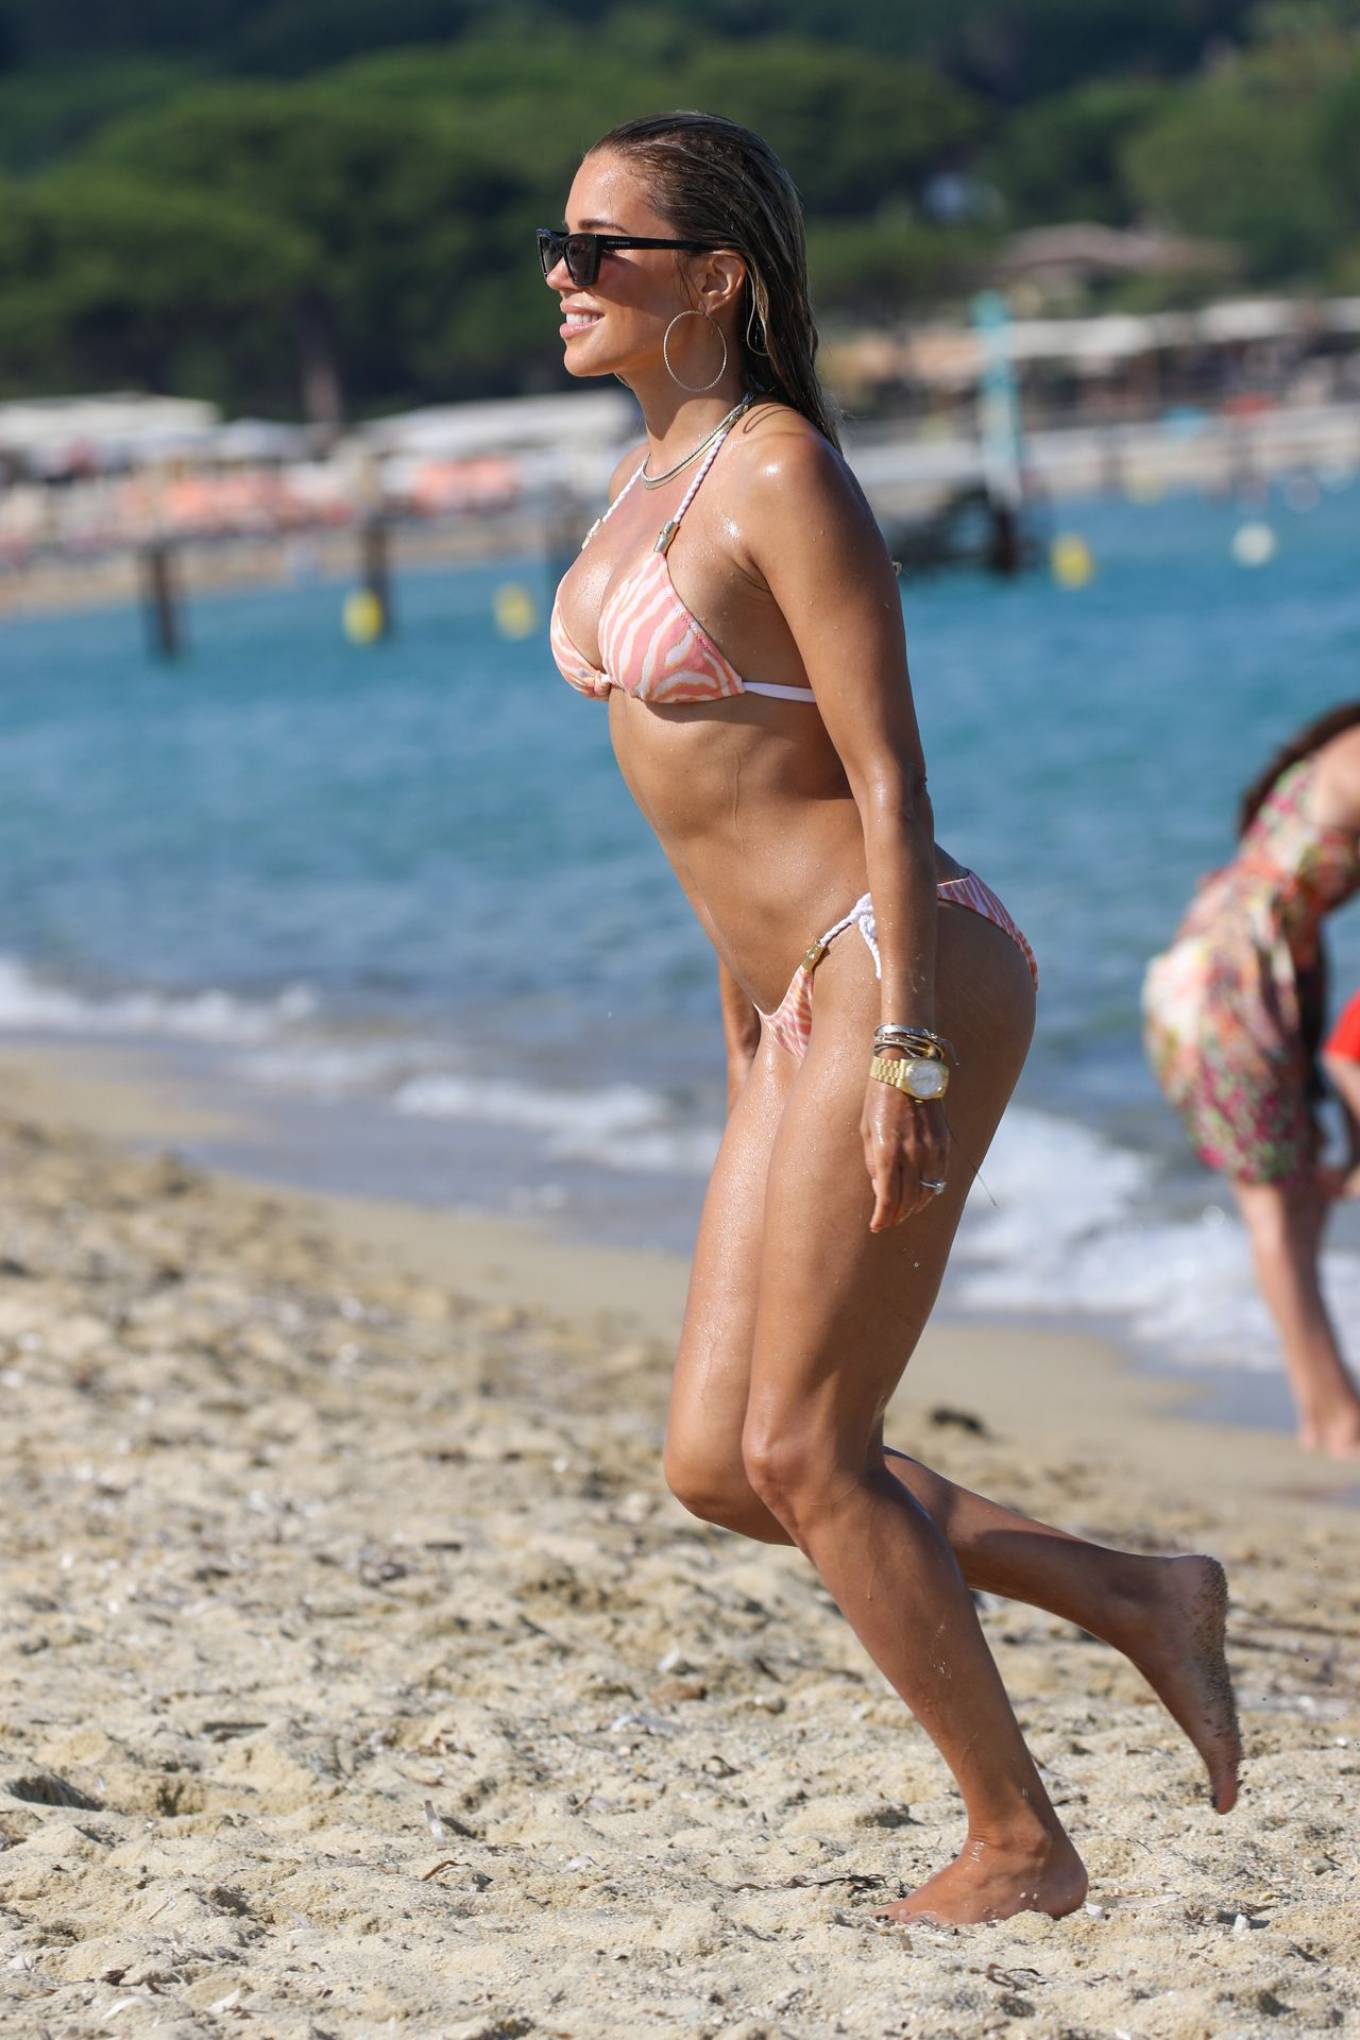 Sylvie Meis 2020 : Sylvie Meis in Bikini 2020-06